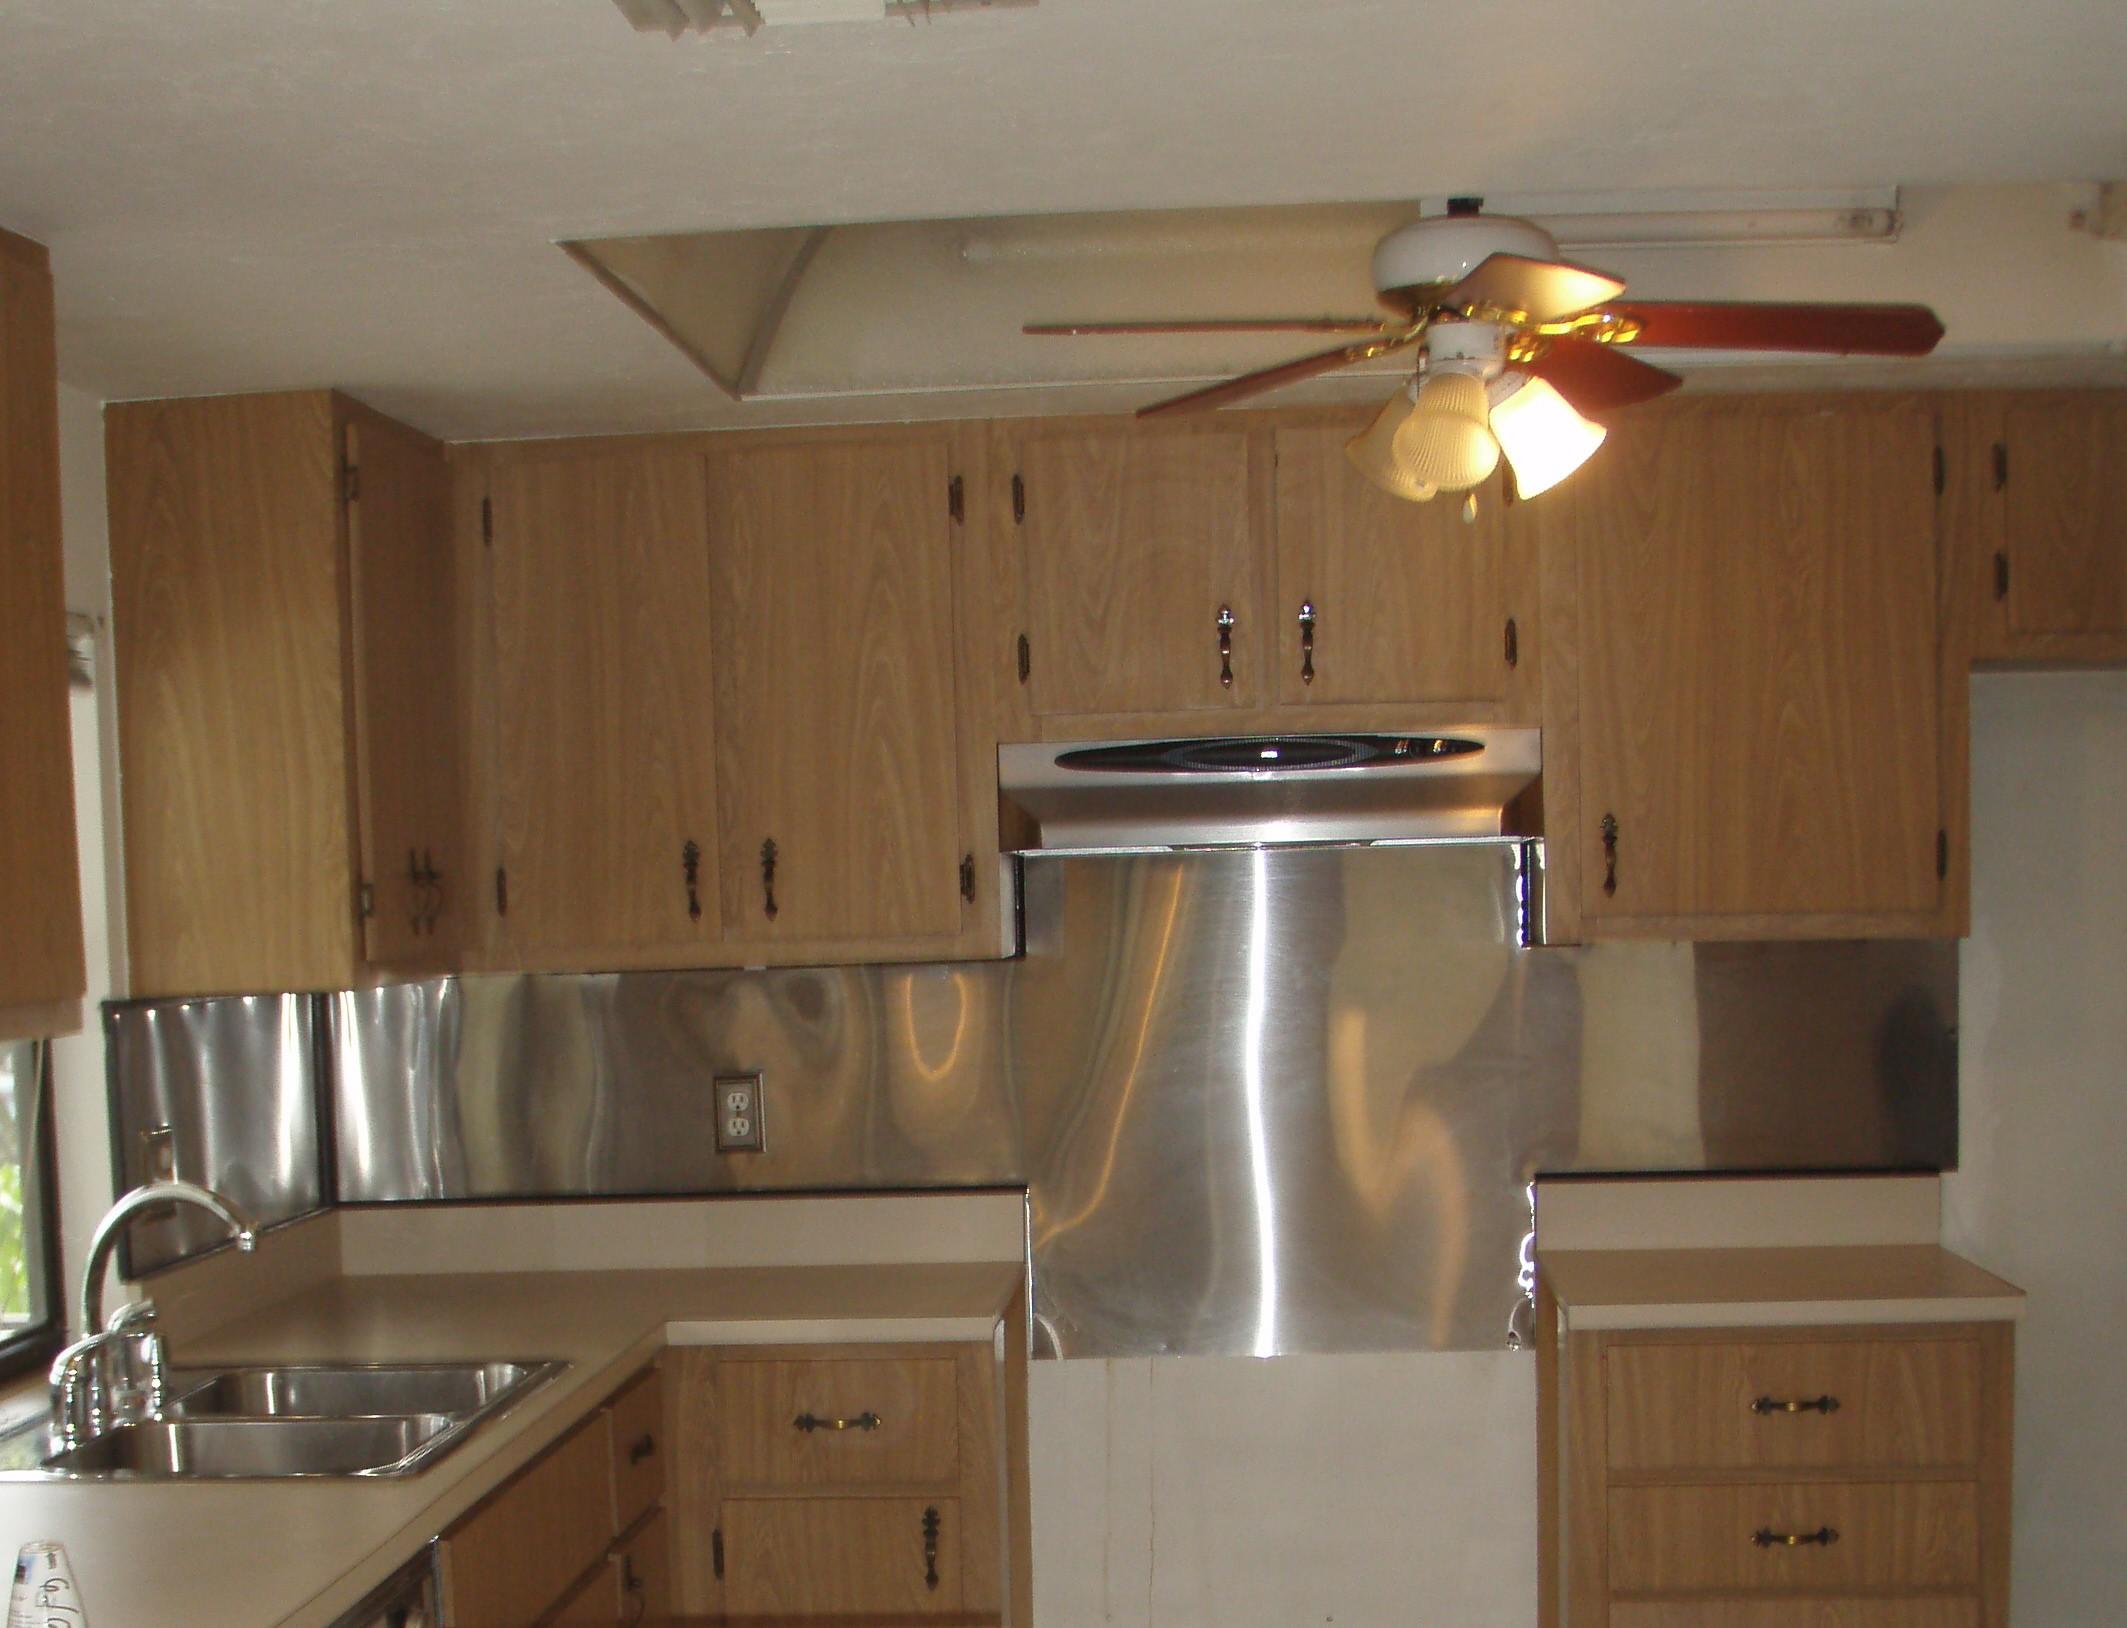 Kitchen fluorescent lighting Photo - 7